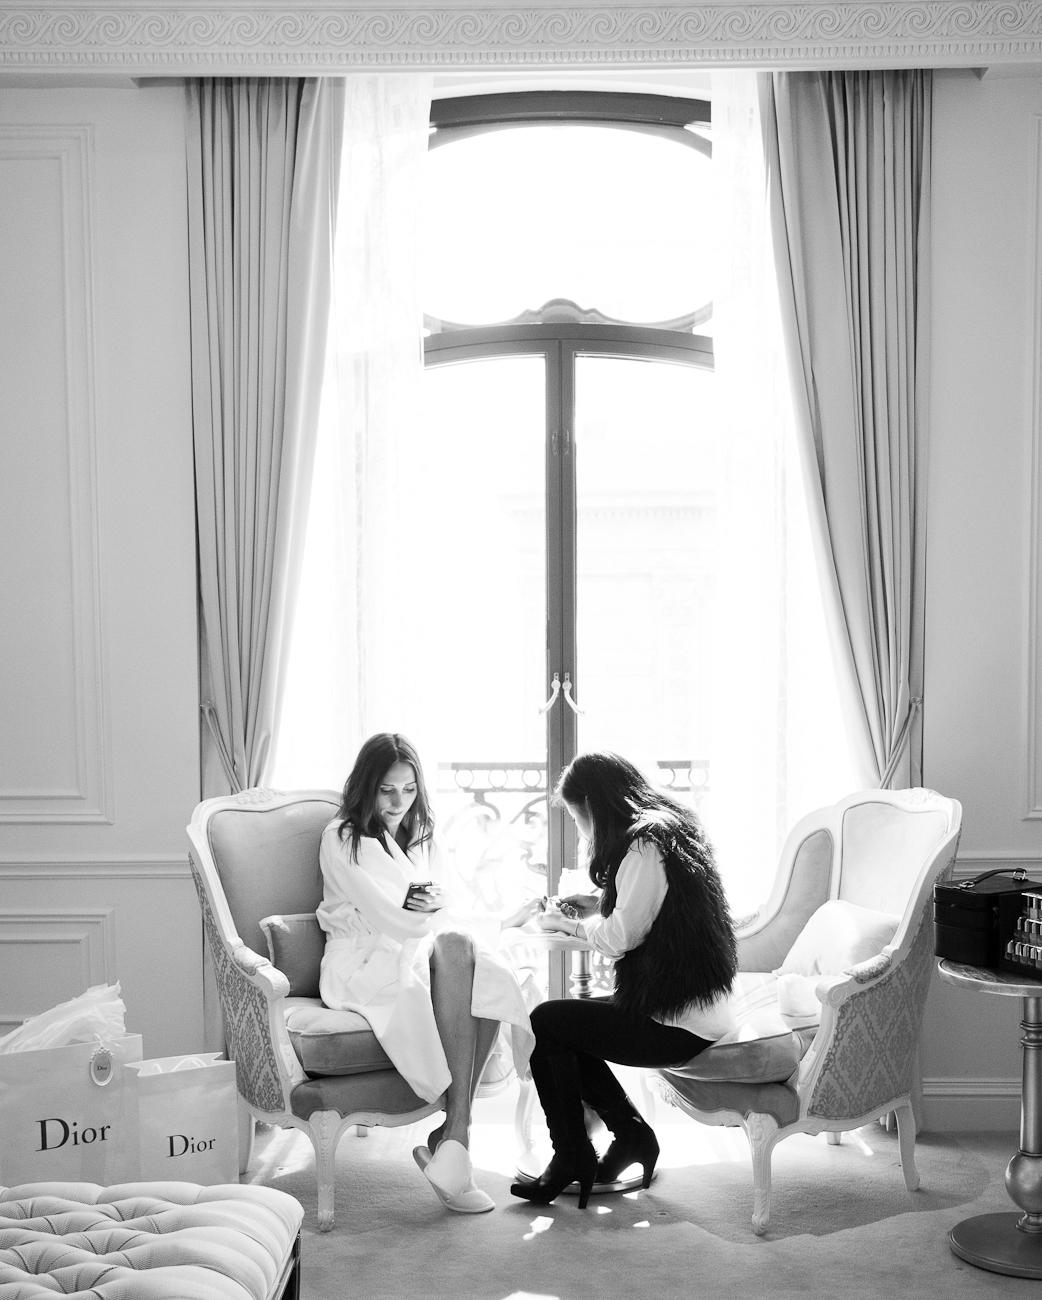 Dior_Jamie_Lee_Reardin-4